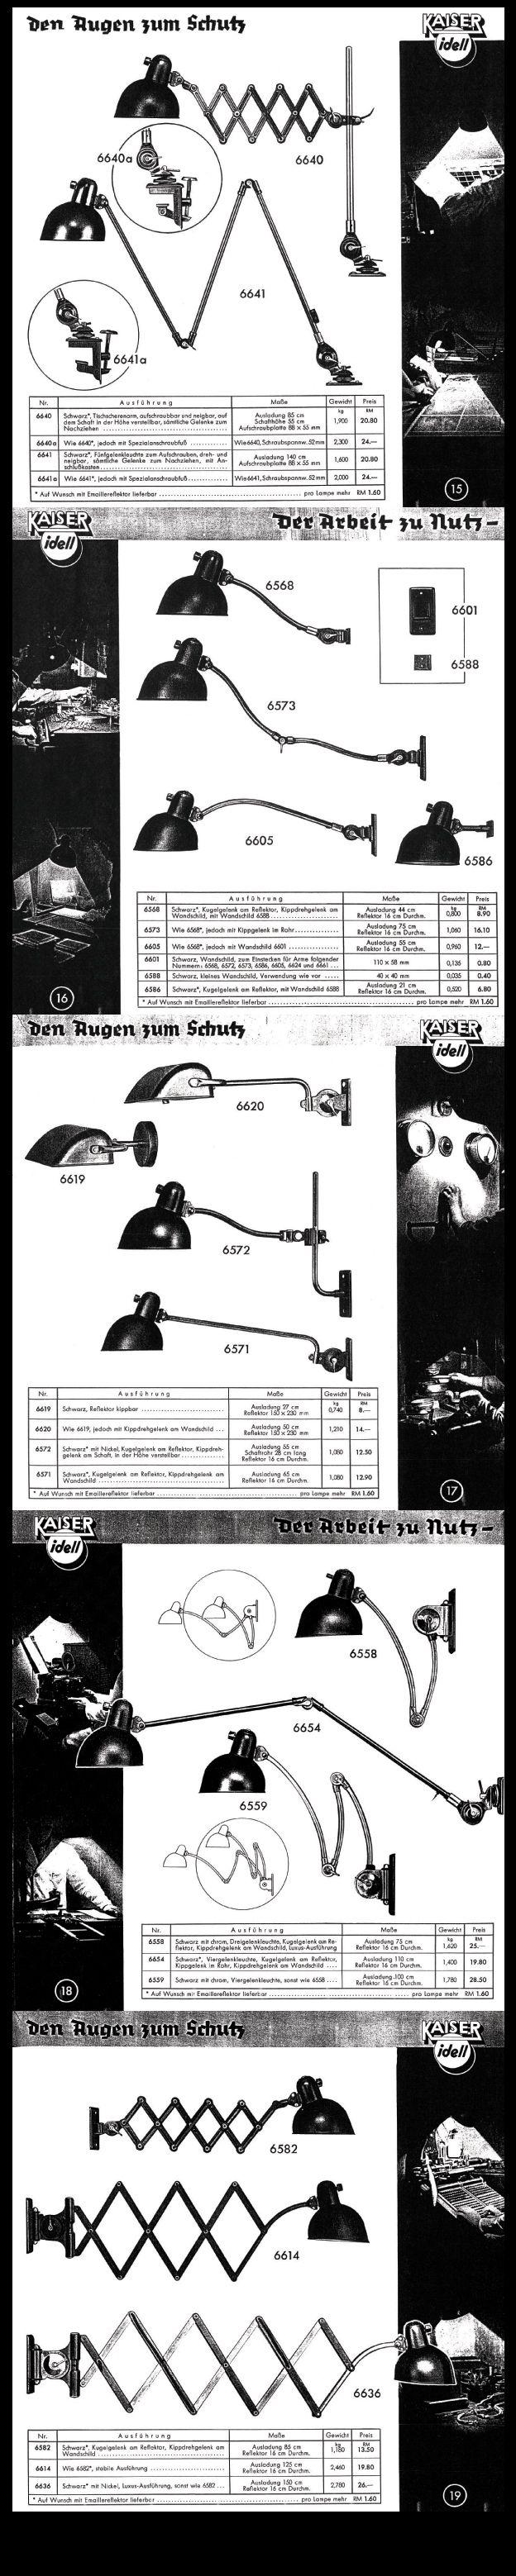 Rare Kaiser & Co. Work Lamp Catalogue 1936 - Pages 15 to 19 #KaiserIdell #Kaiser_Idell #ChristianDell #Bauhaus #Modernism #Modernist #Molecula